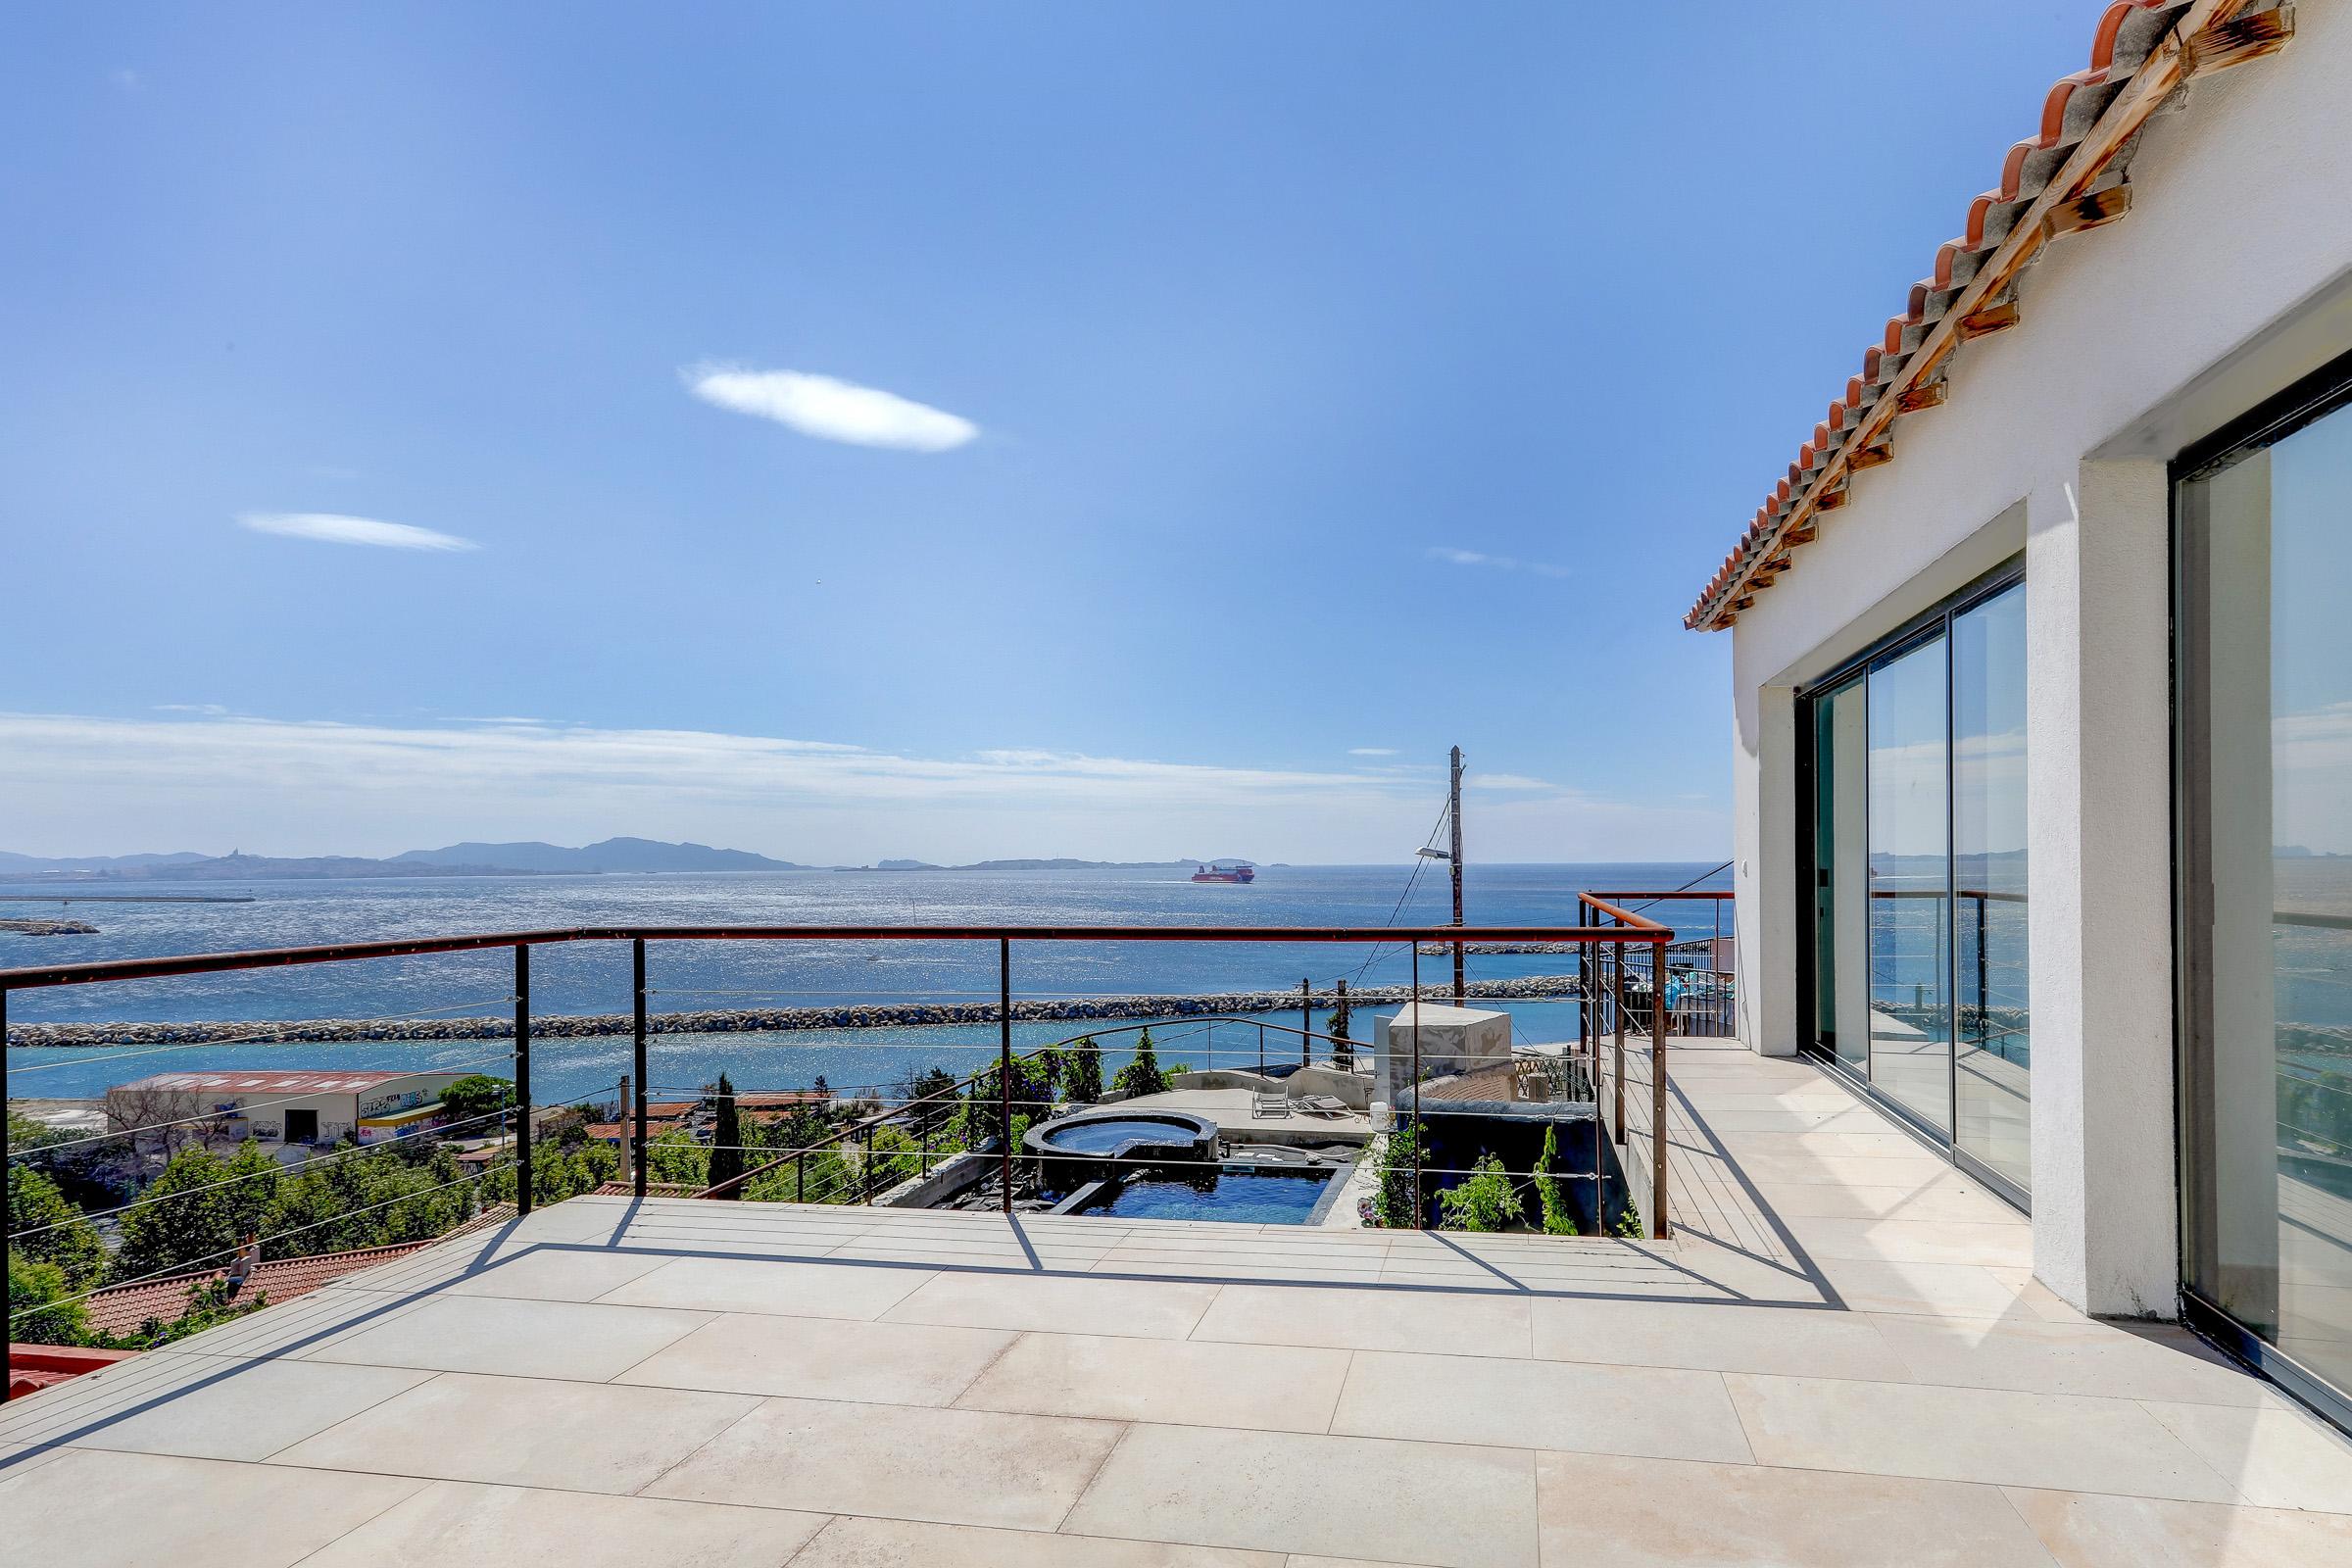 ma-terrasse-a-marseille-maison-piscine-vue-mer-13006-19